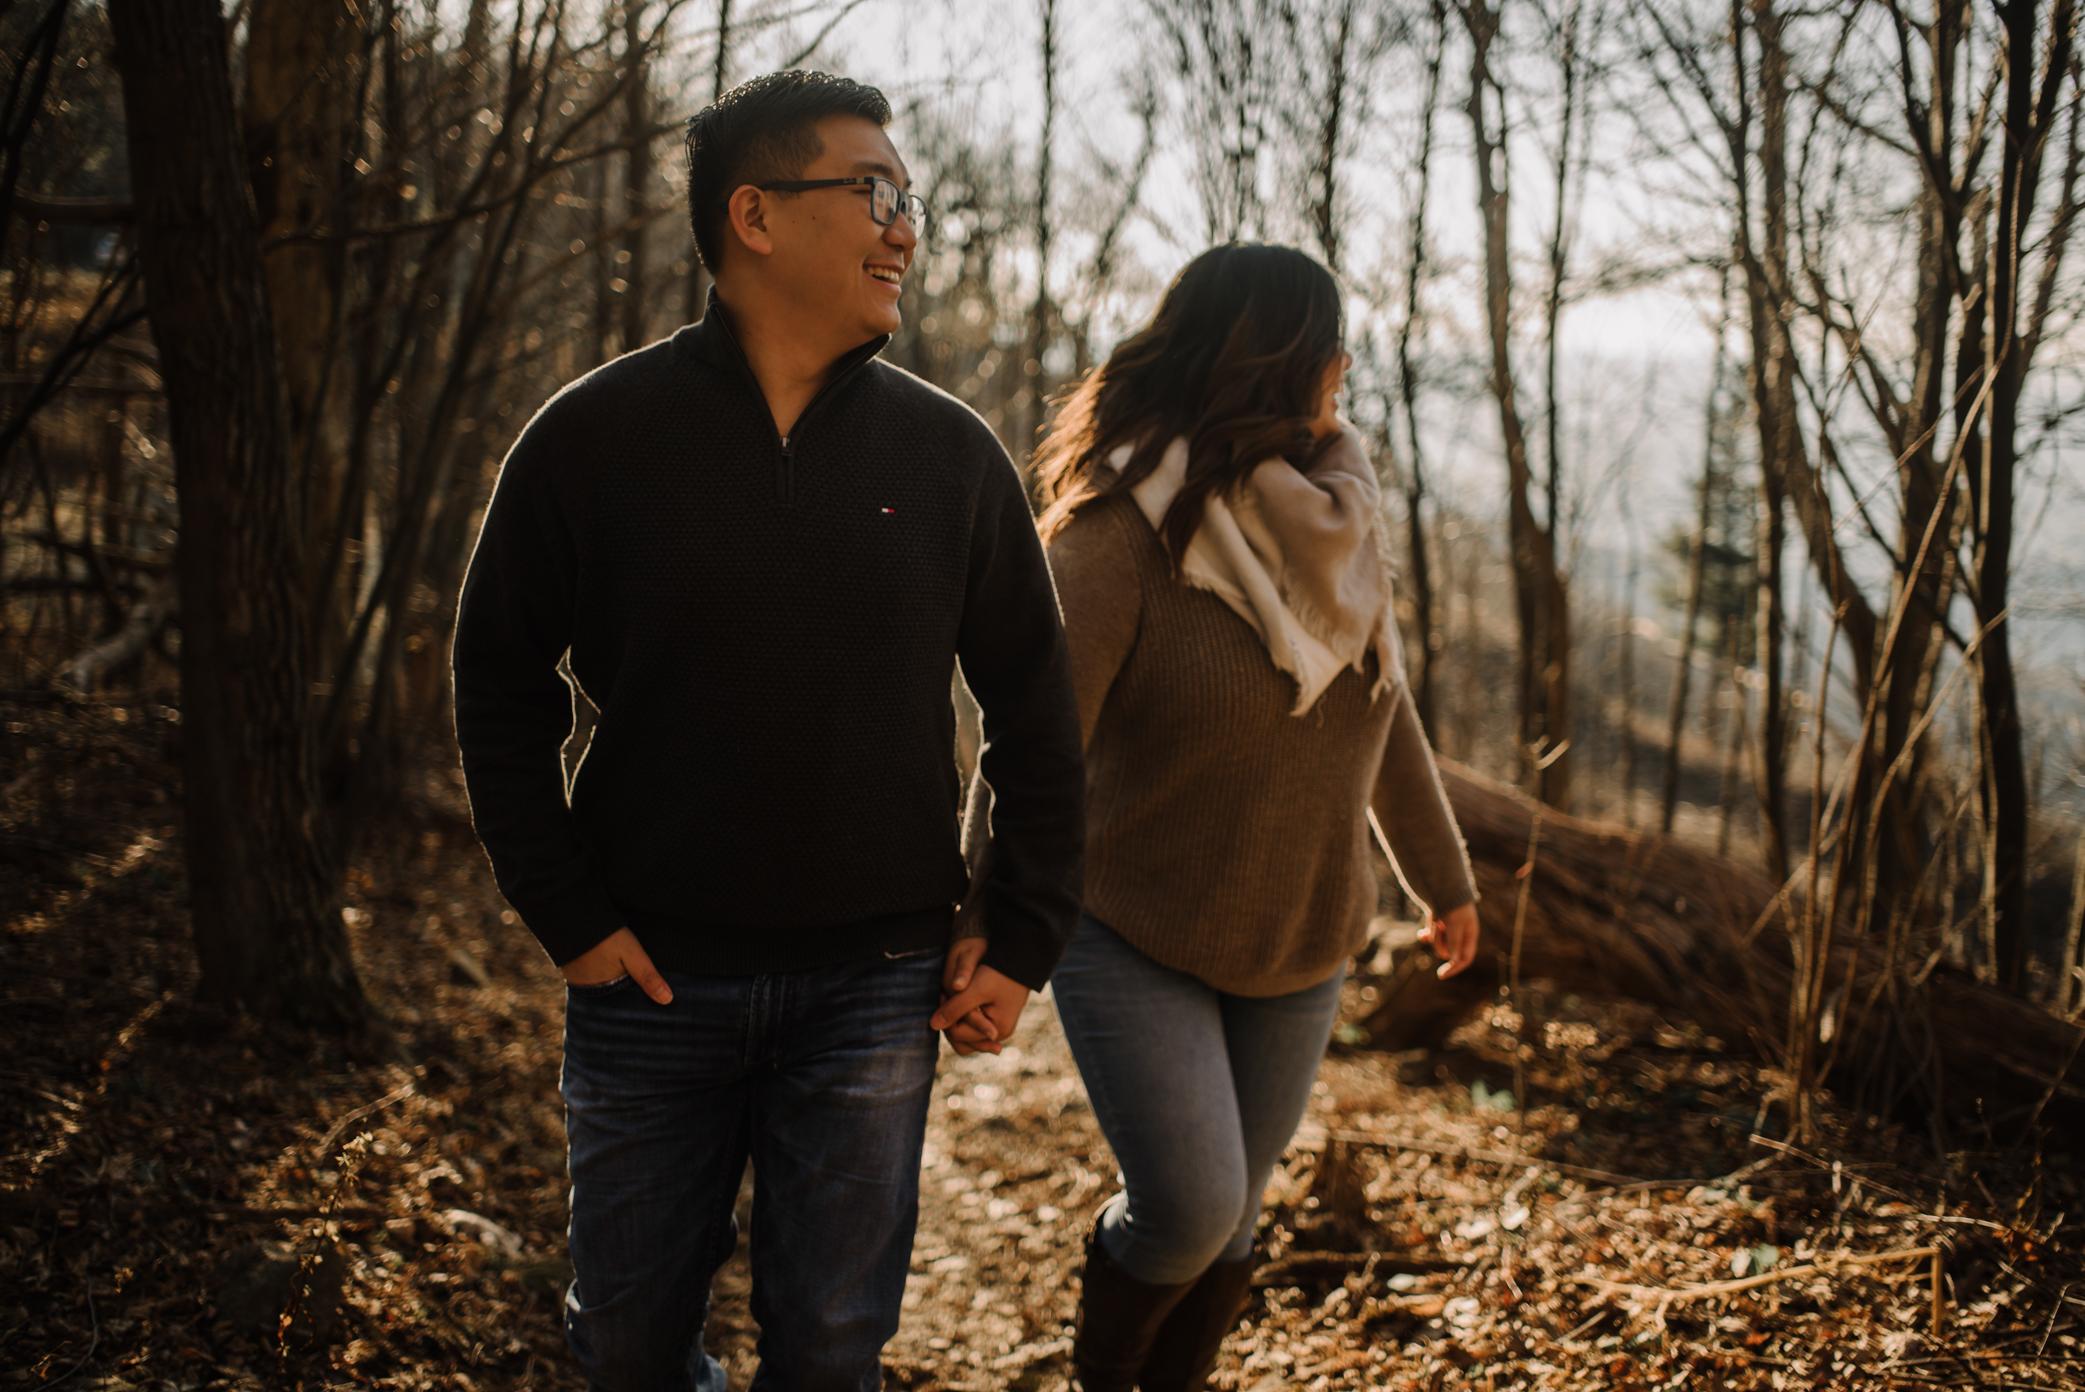 Joshua and Kristina - Shenandoah National Park - Skyline Drive - Winter Engagement Session Photographer - White Sails Creative_12.JPG